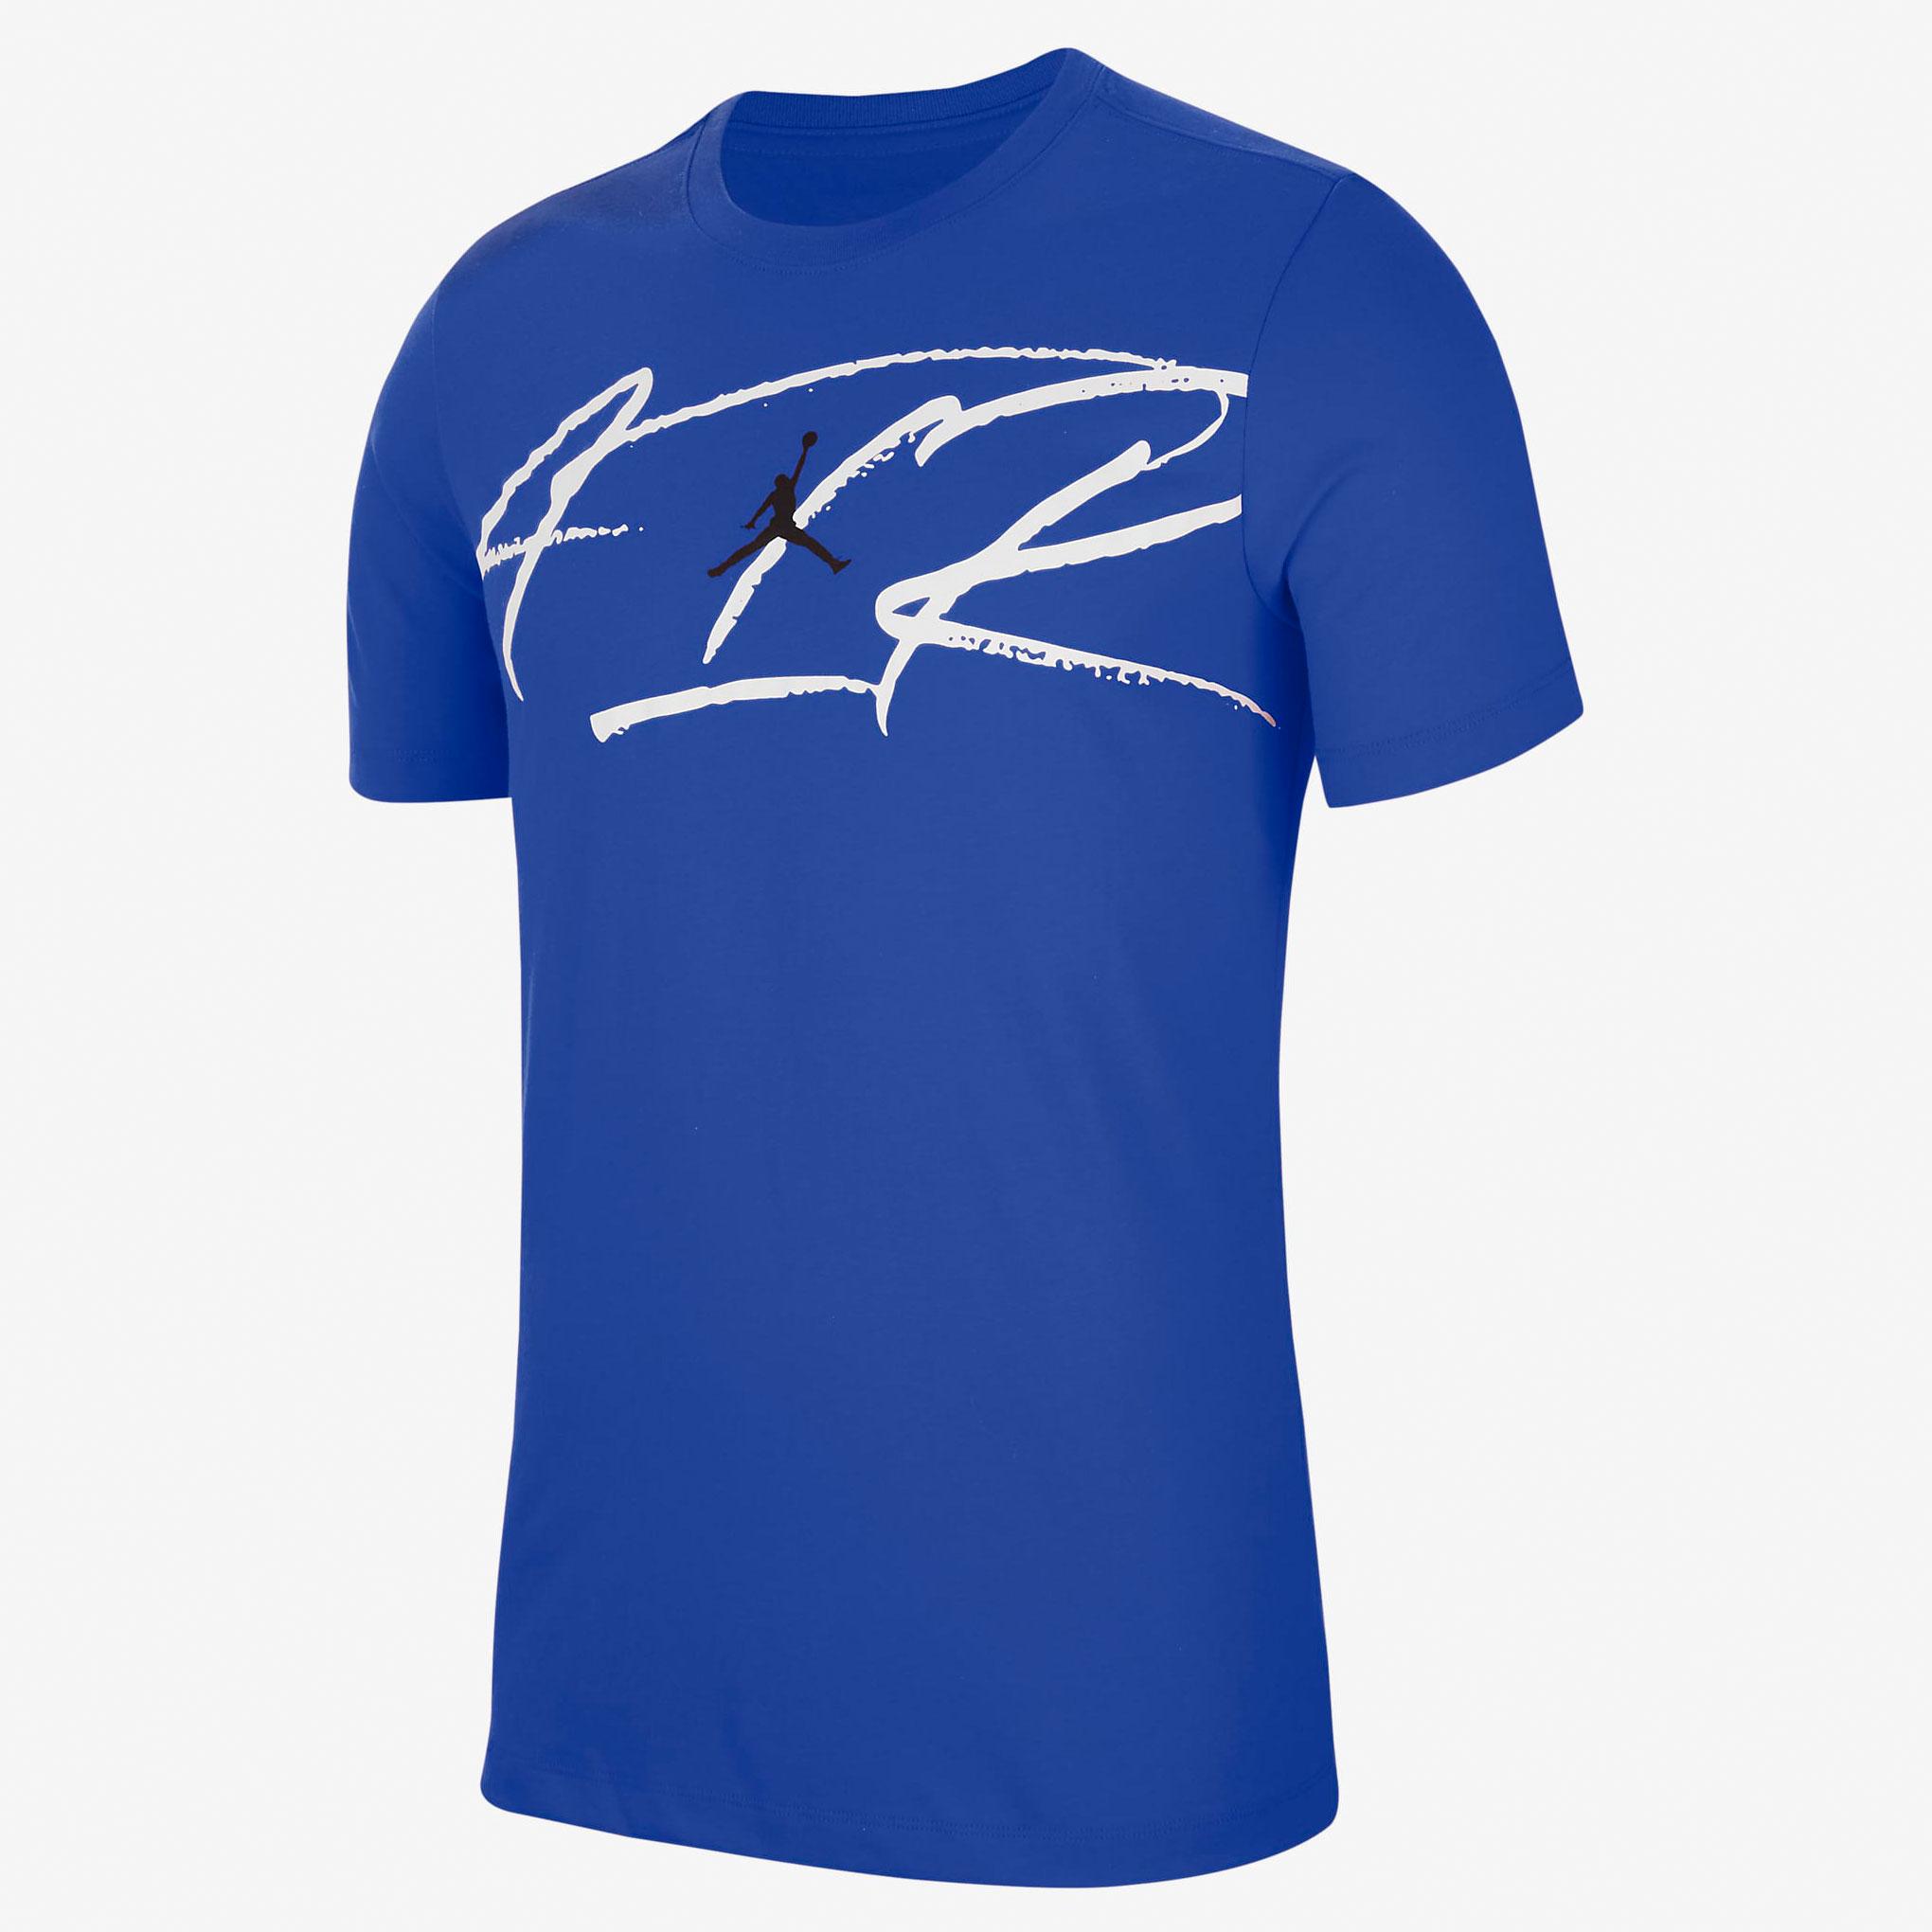 air-jordan-1-low-hyper-royal-shirt